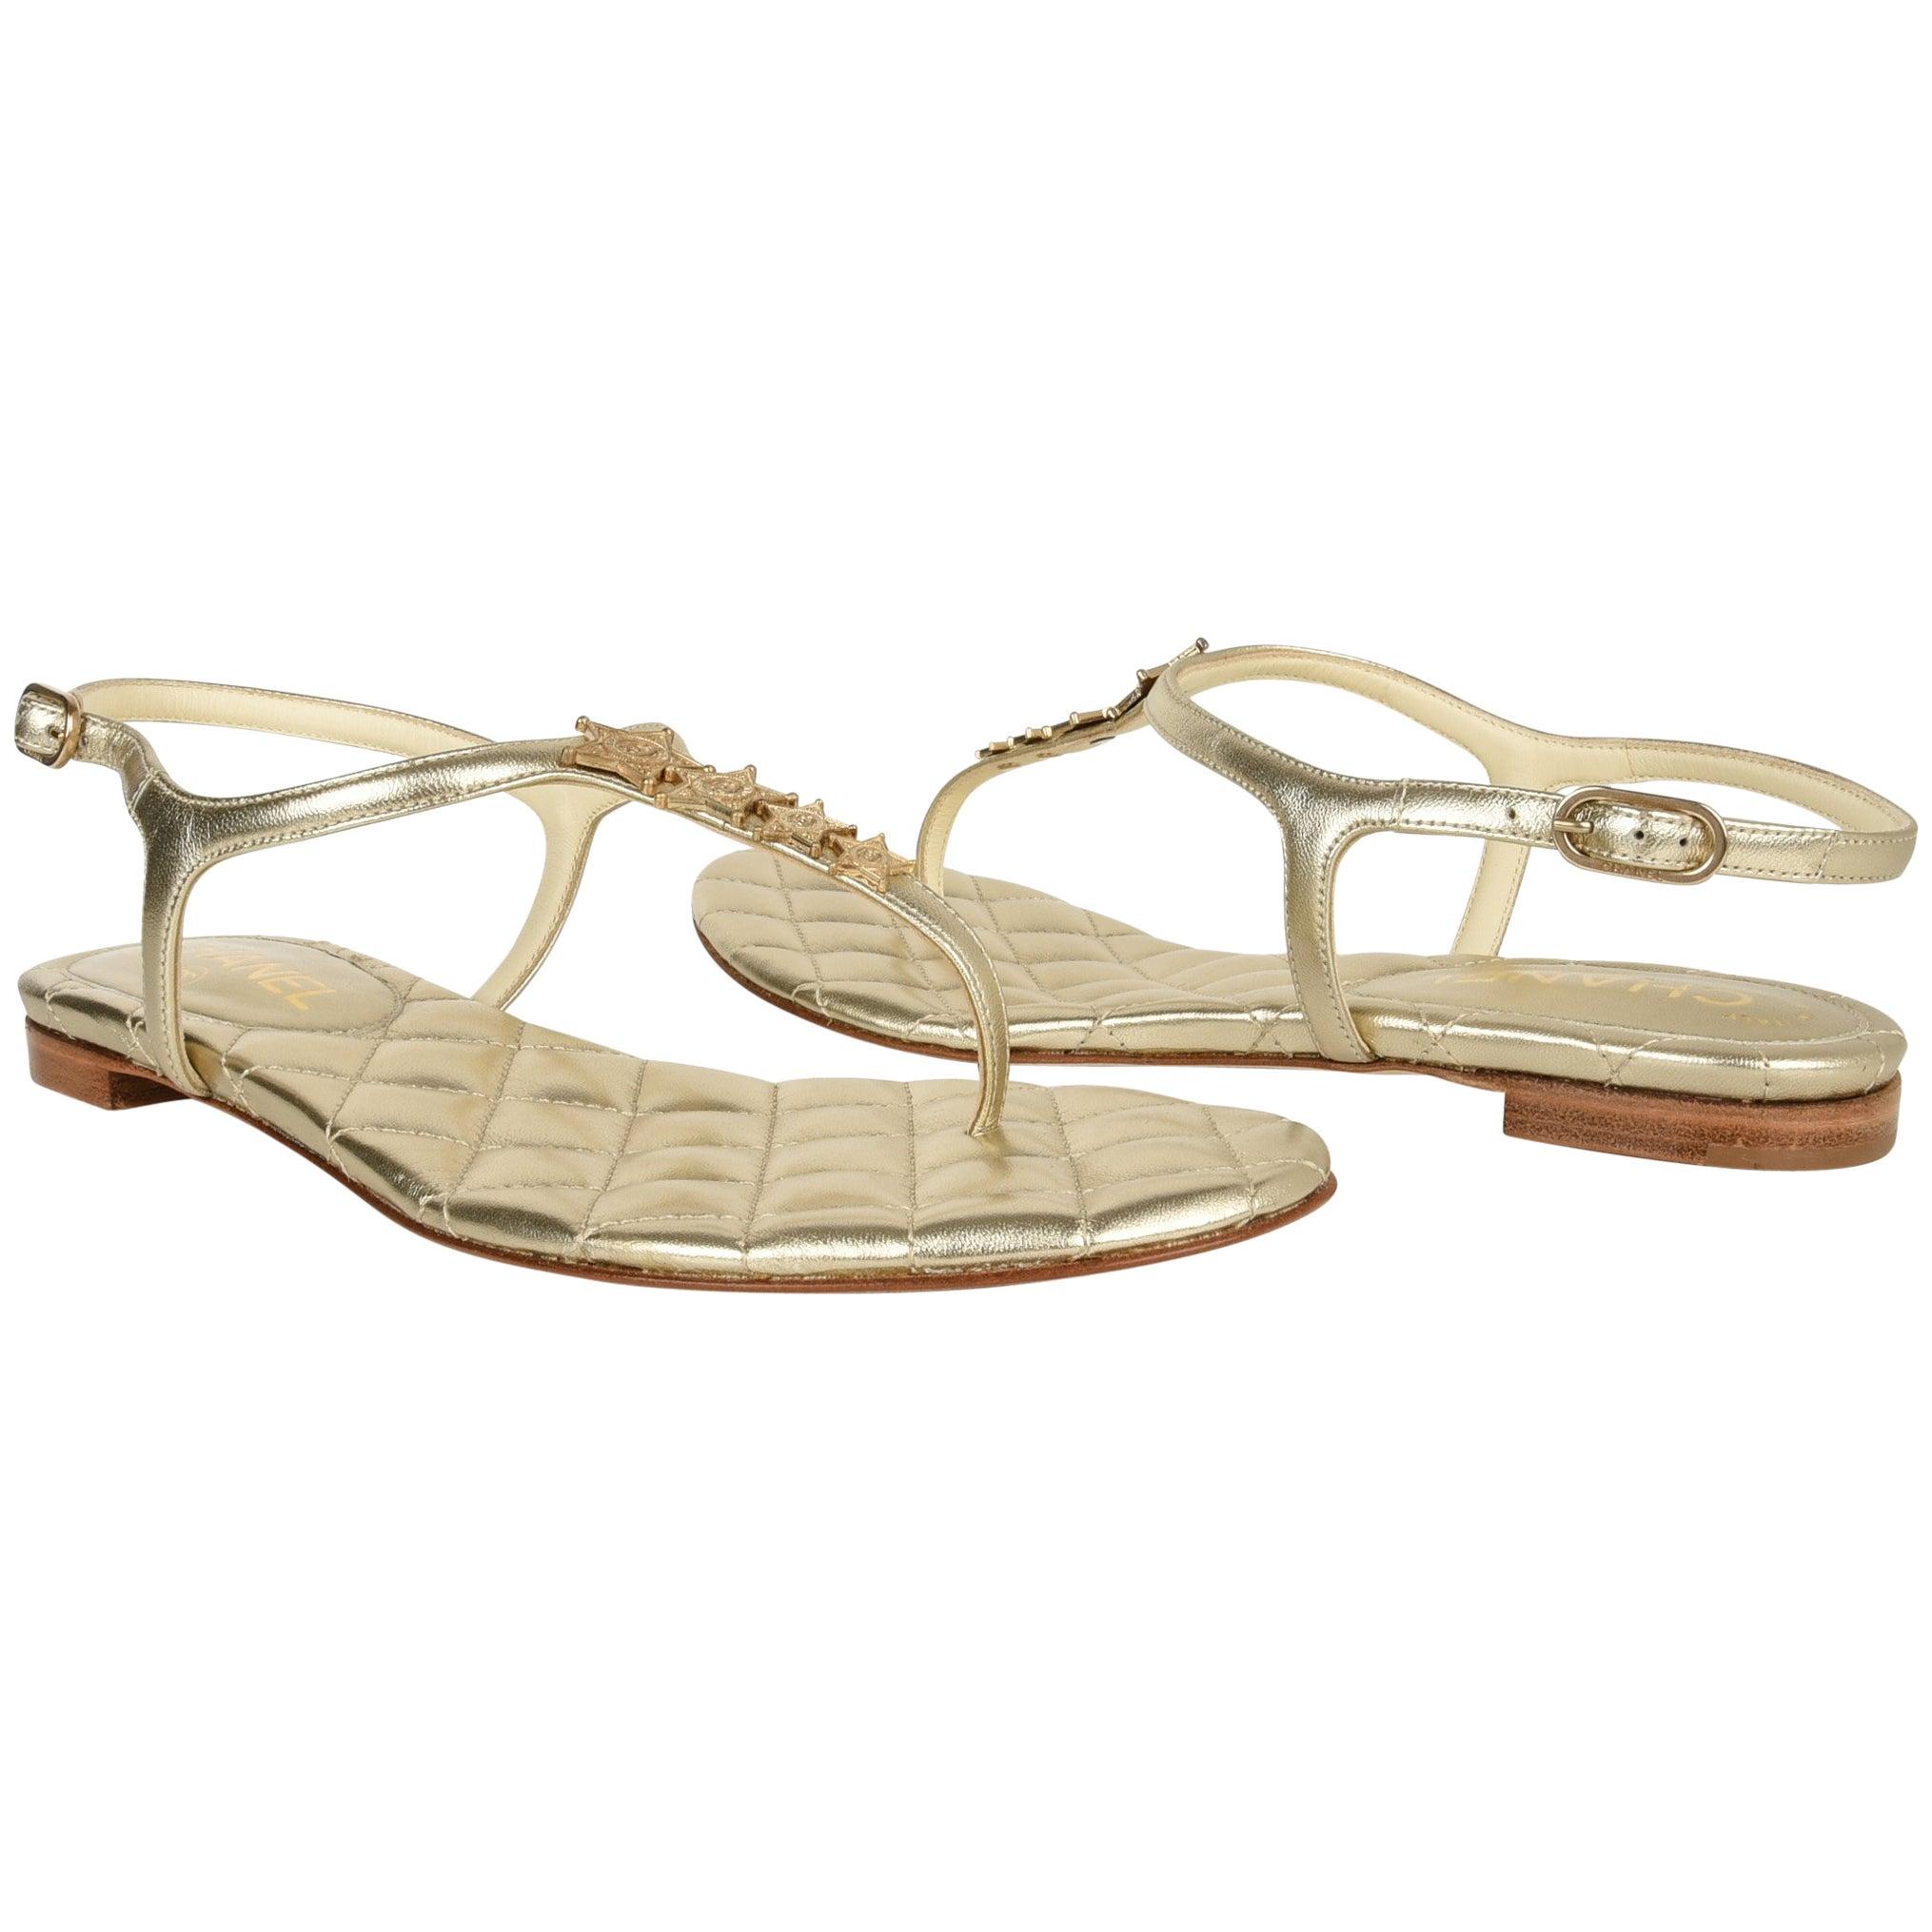 3c1c973184e419 Chanel Shoe CC Star Paris Dallas Gold T-Strap Thong Sandals 38 C   8 New at  1stdibs